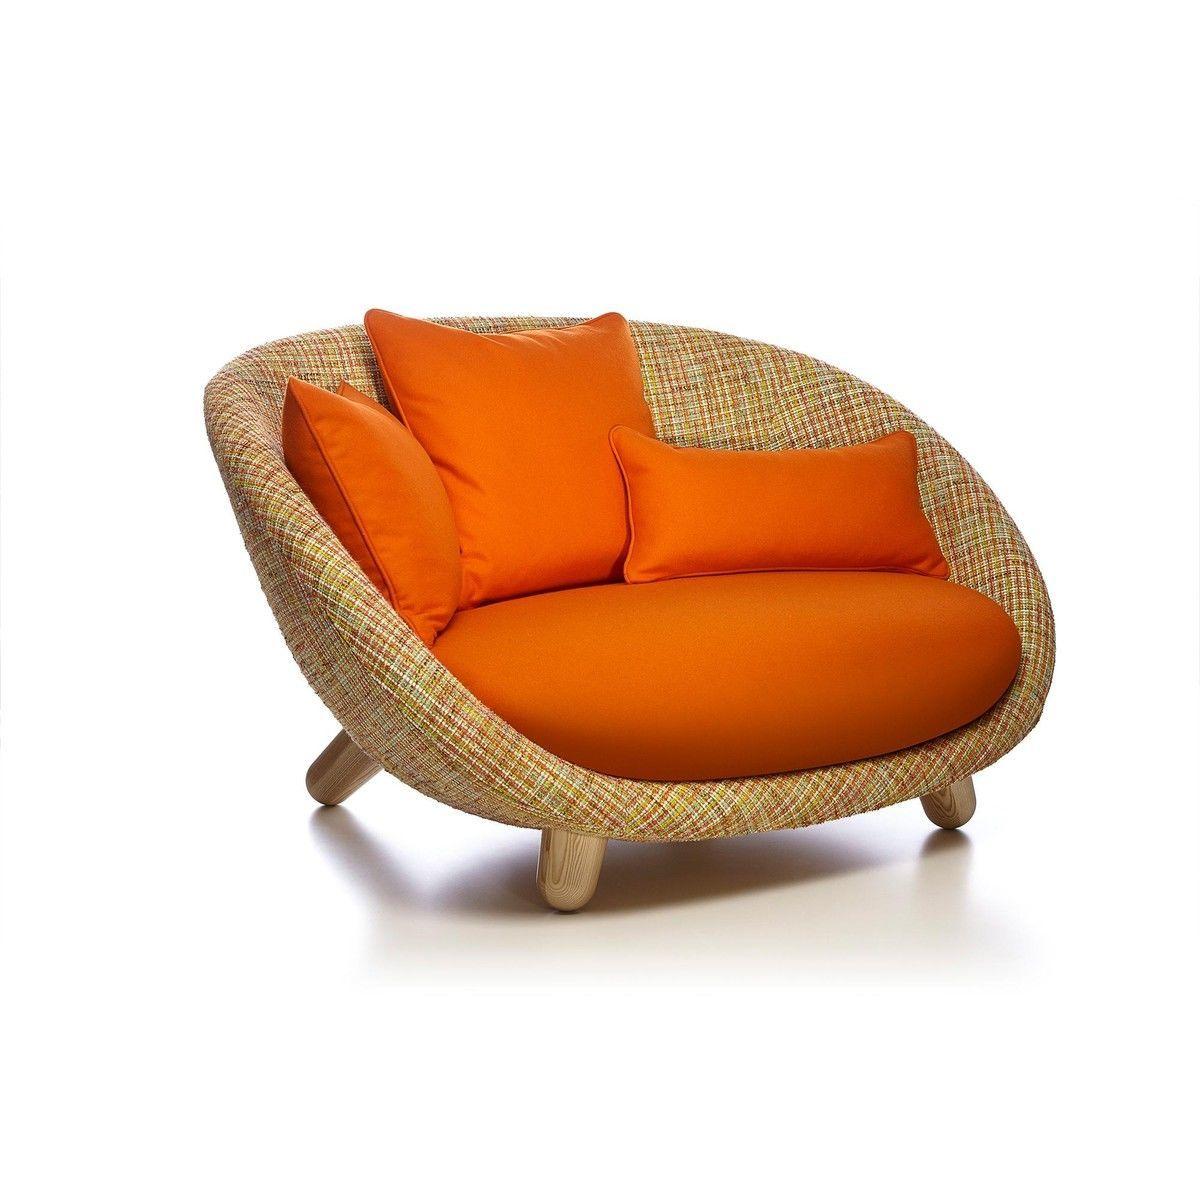 moooi love sofa  Love Sofas Designer Overlapping Backed Sofa Made In The Usa Living  . Love Chairs Sofa. Home Design Ideas